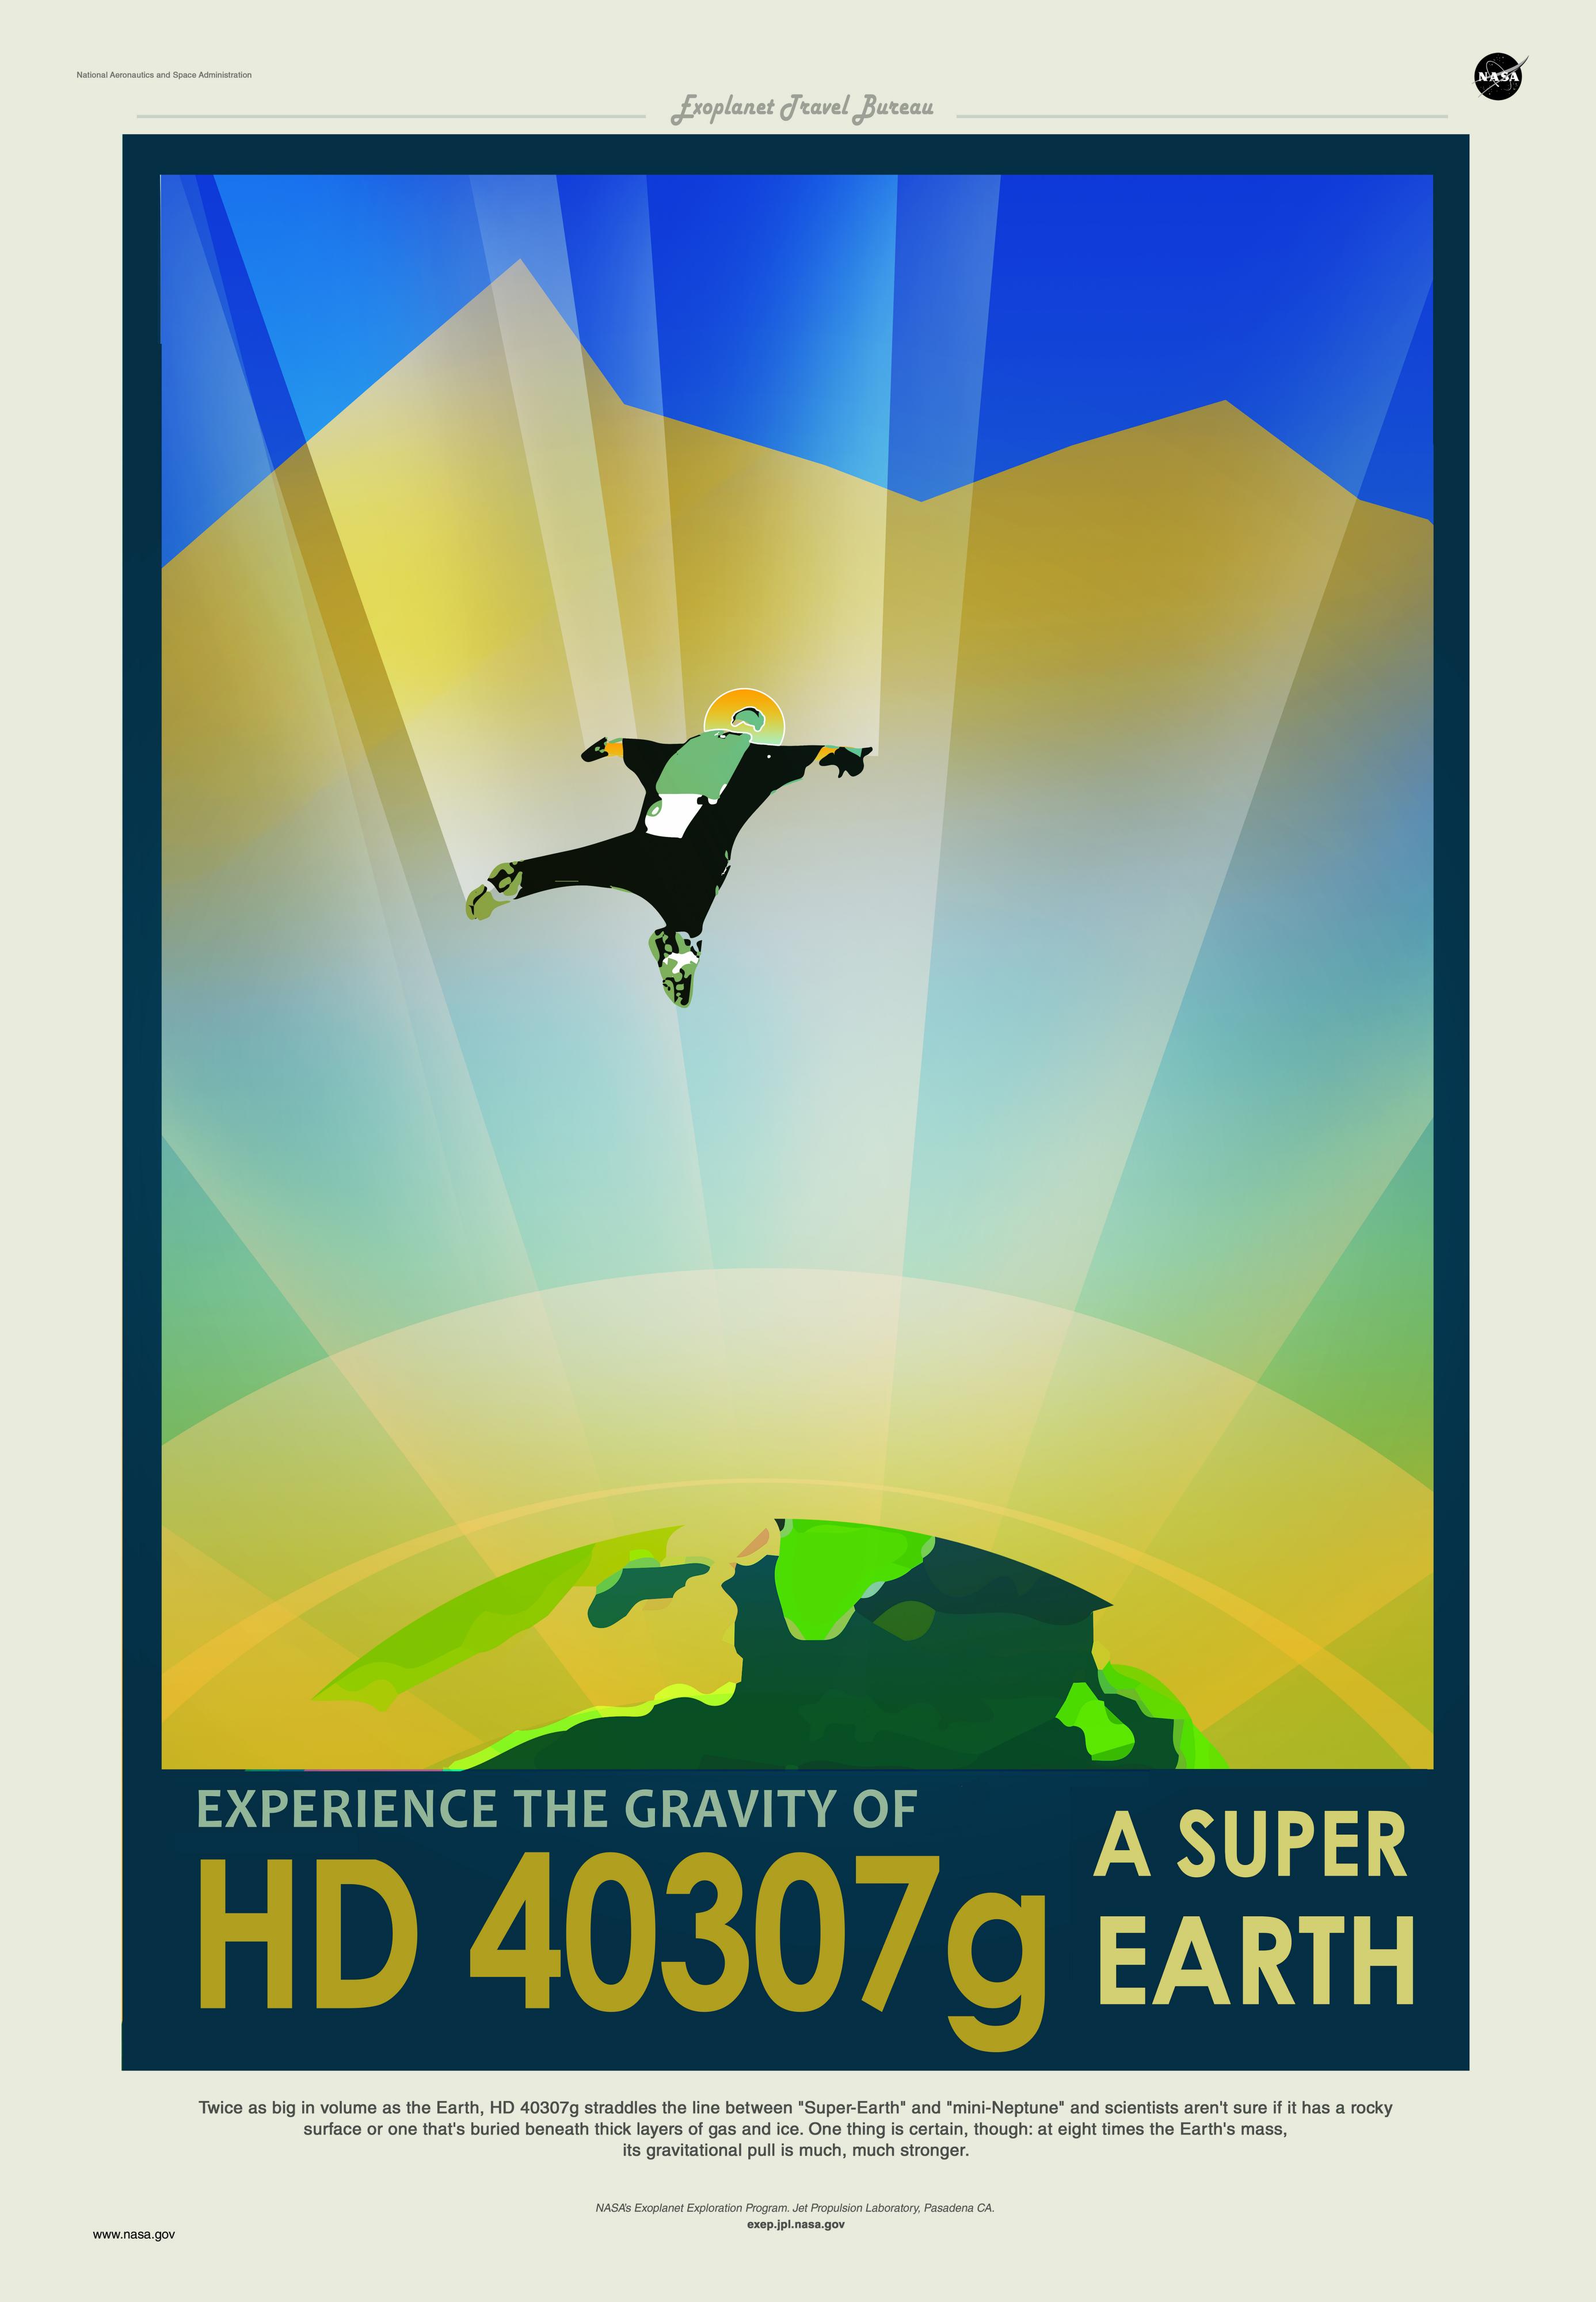 NASA Exoplanet Travel Bureau Multiple Sizes Kepler-186f Space Travel Poster